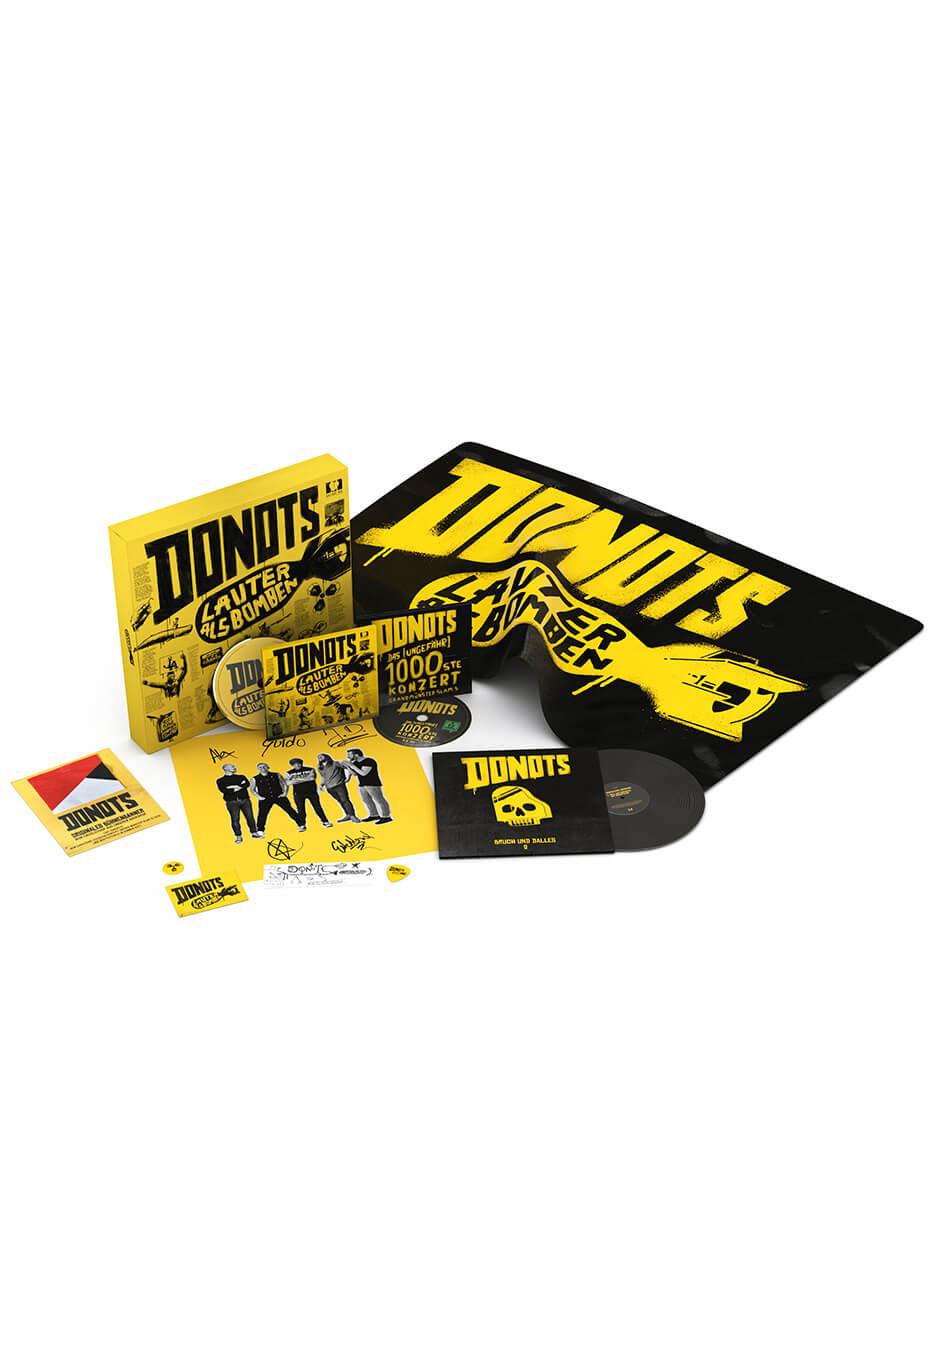 Donots - Lauter Als Bomben Limited Fan Box - CD